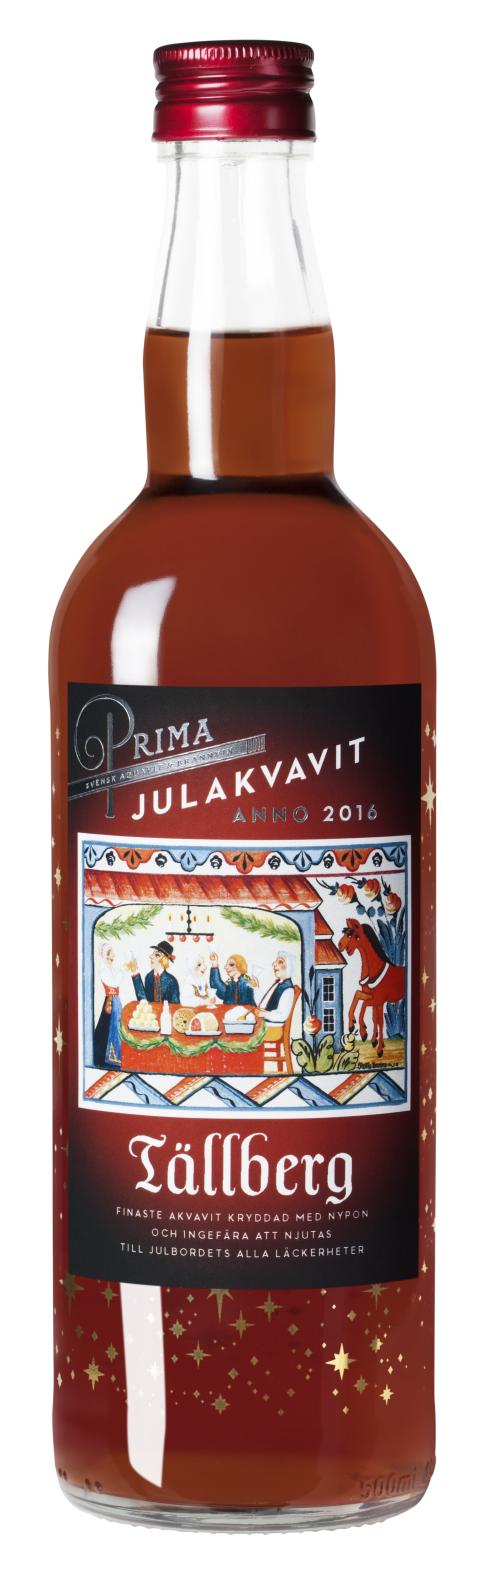 Prima Julakvavit Tällberg 2016, flaskbild